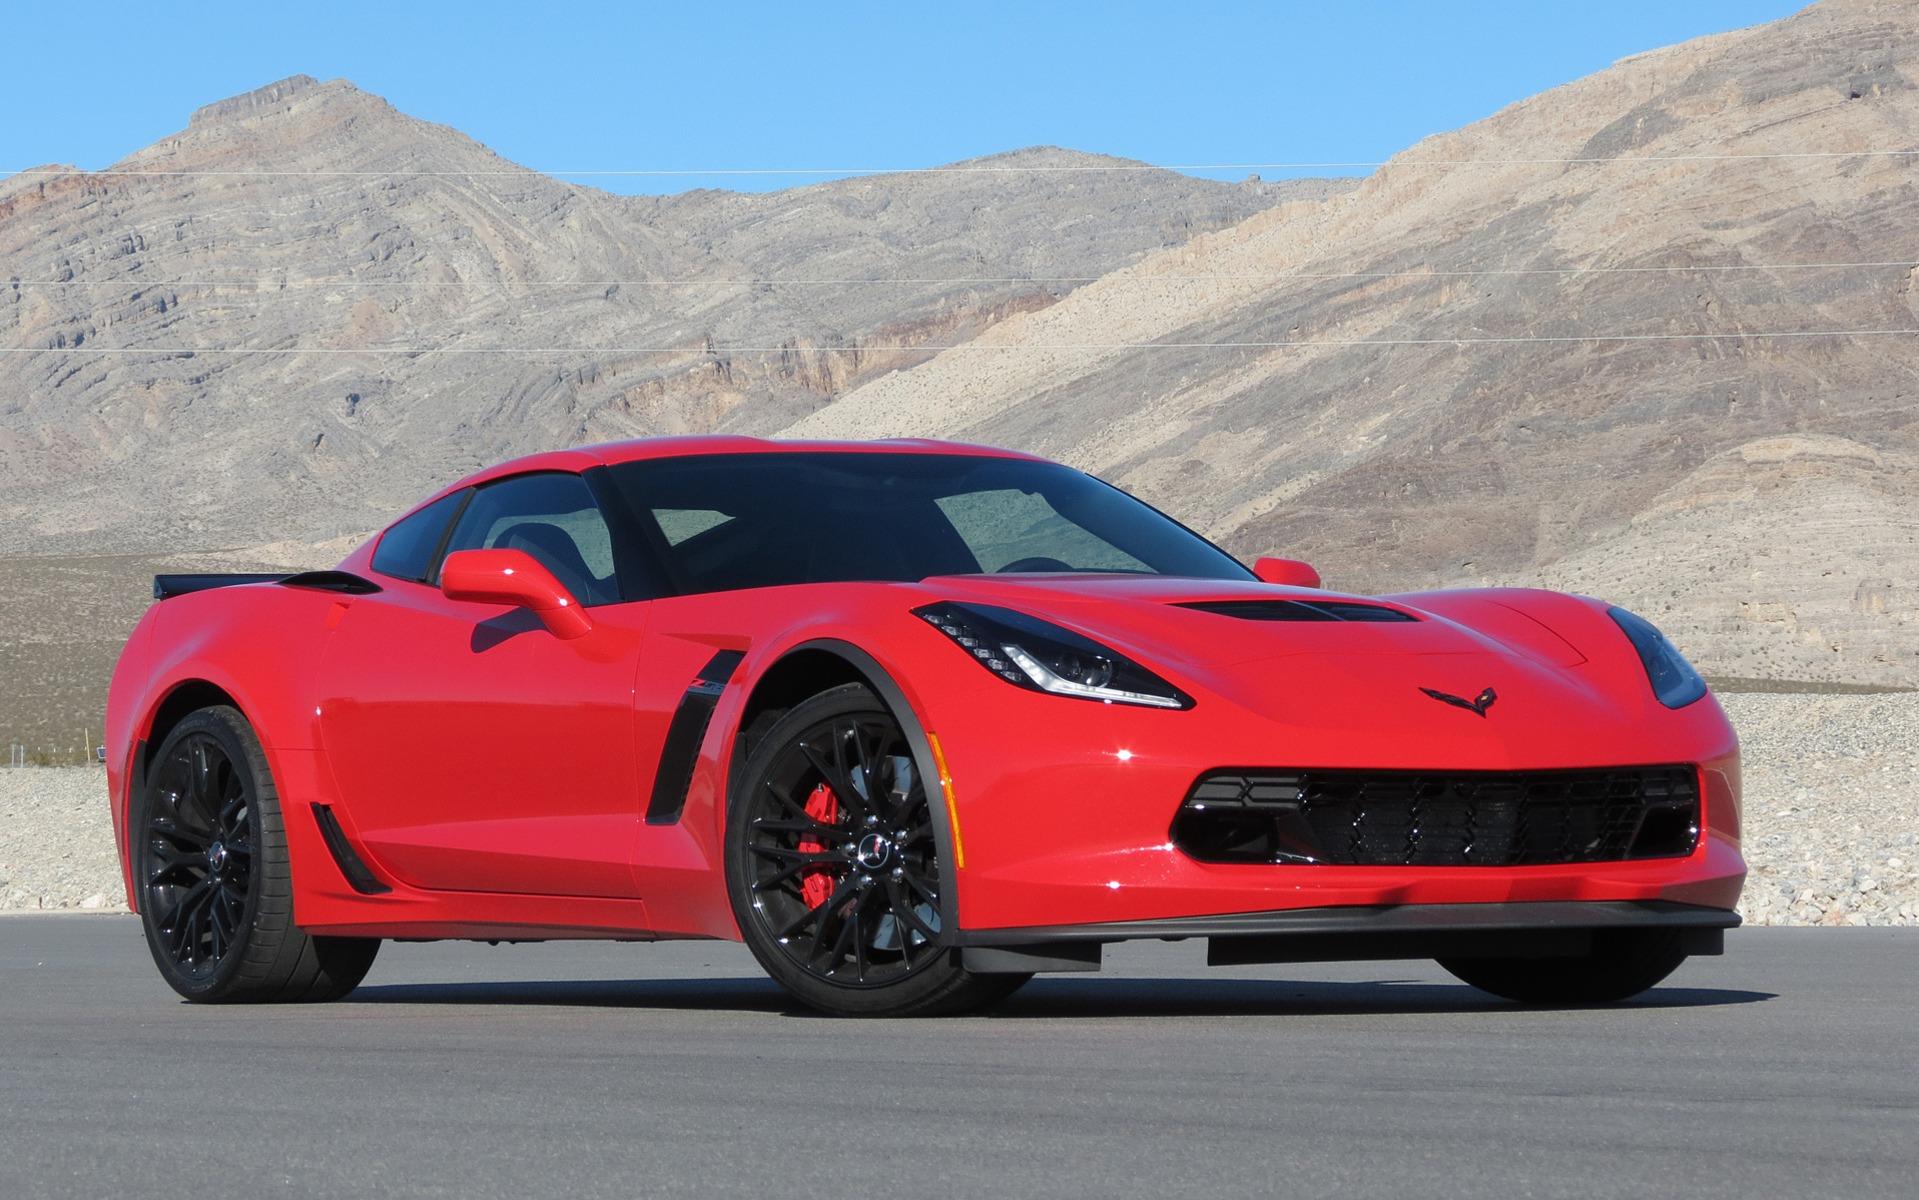 Corvette Z06 2015 en version régulière au circuit Spring Mountain